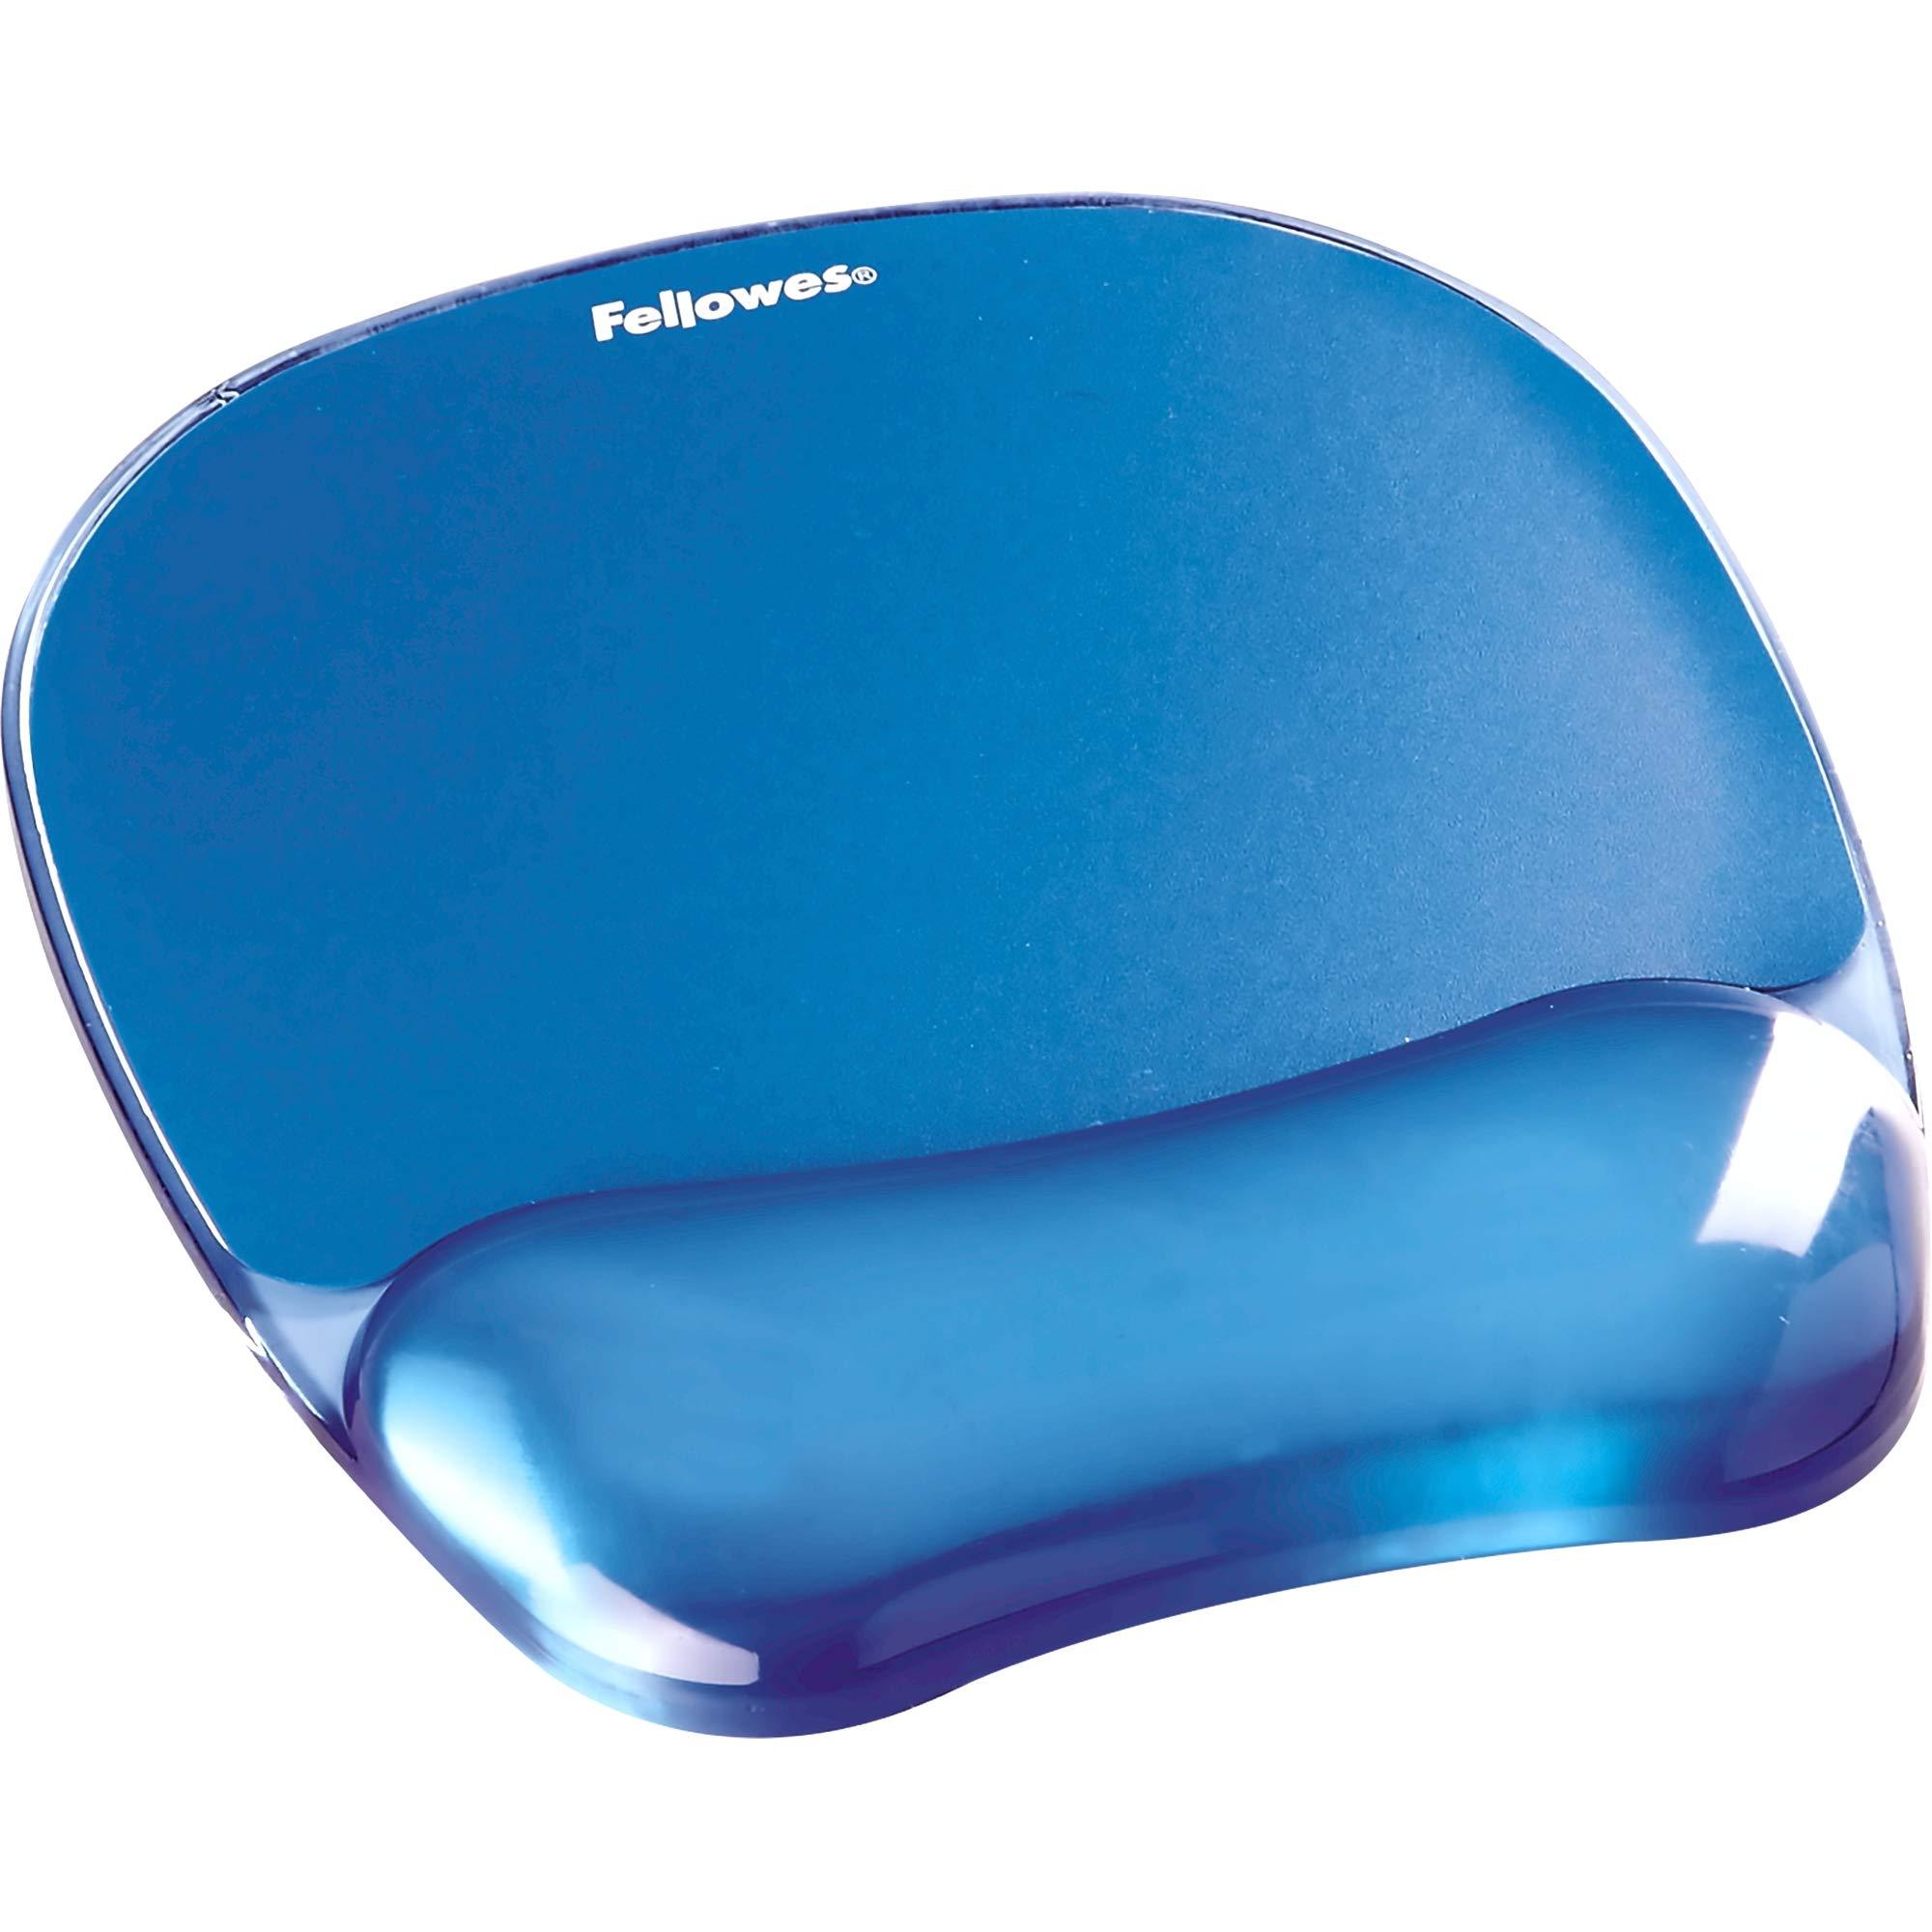 Fellowes Gel Crystal Mousepad/Wrist Rest, Blue (91141) by Fellowes